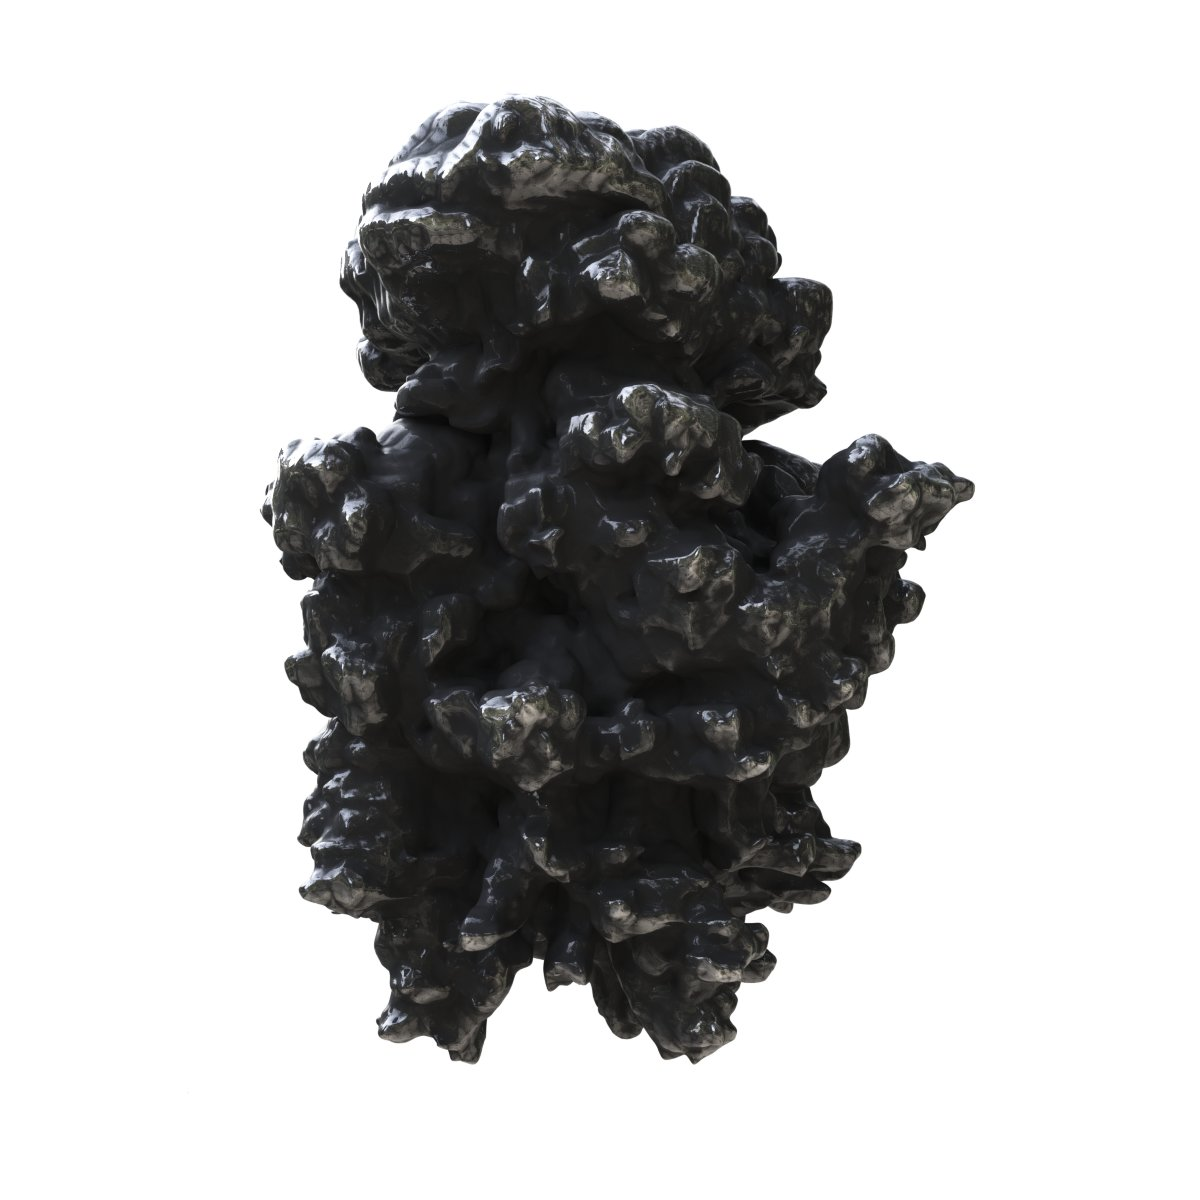 Kresimir jelusic 5